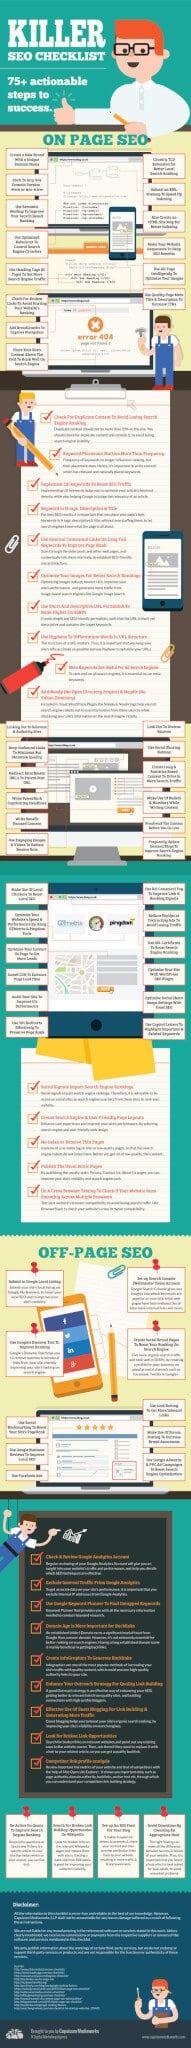 checklist-seo-negocio-infografia